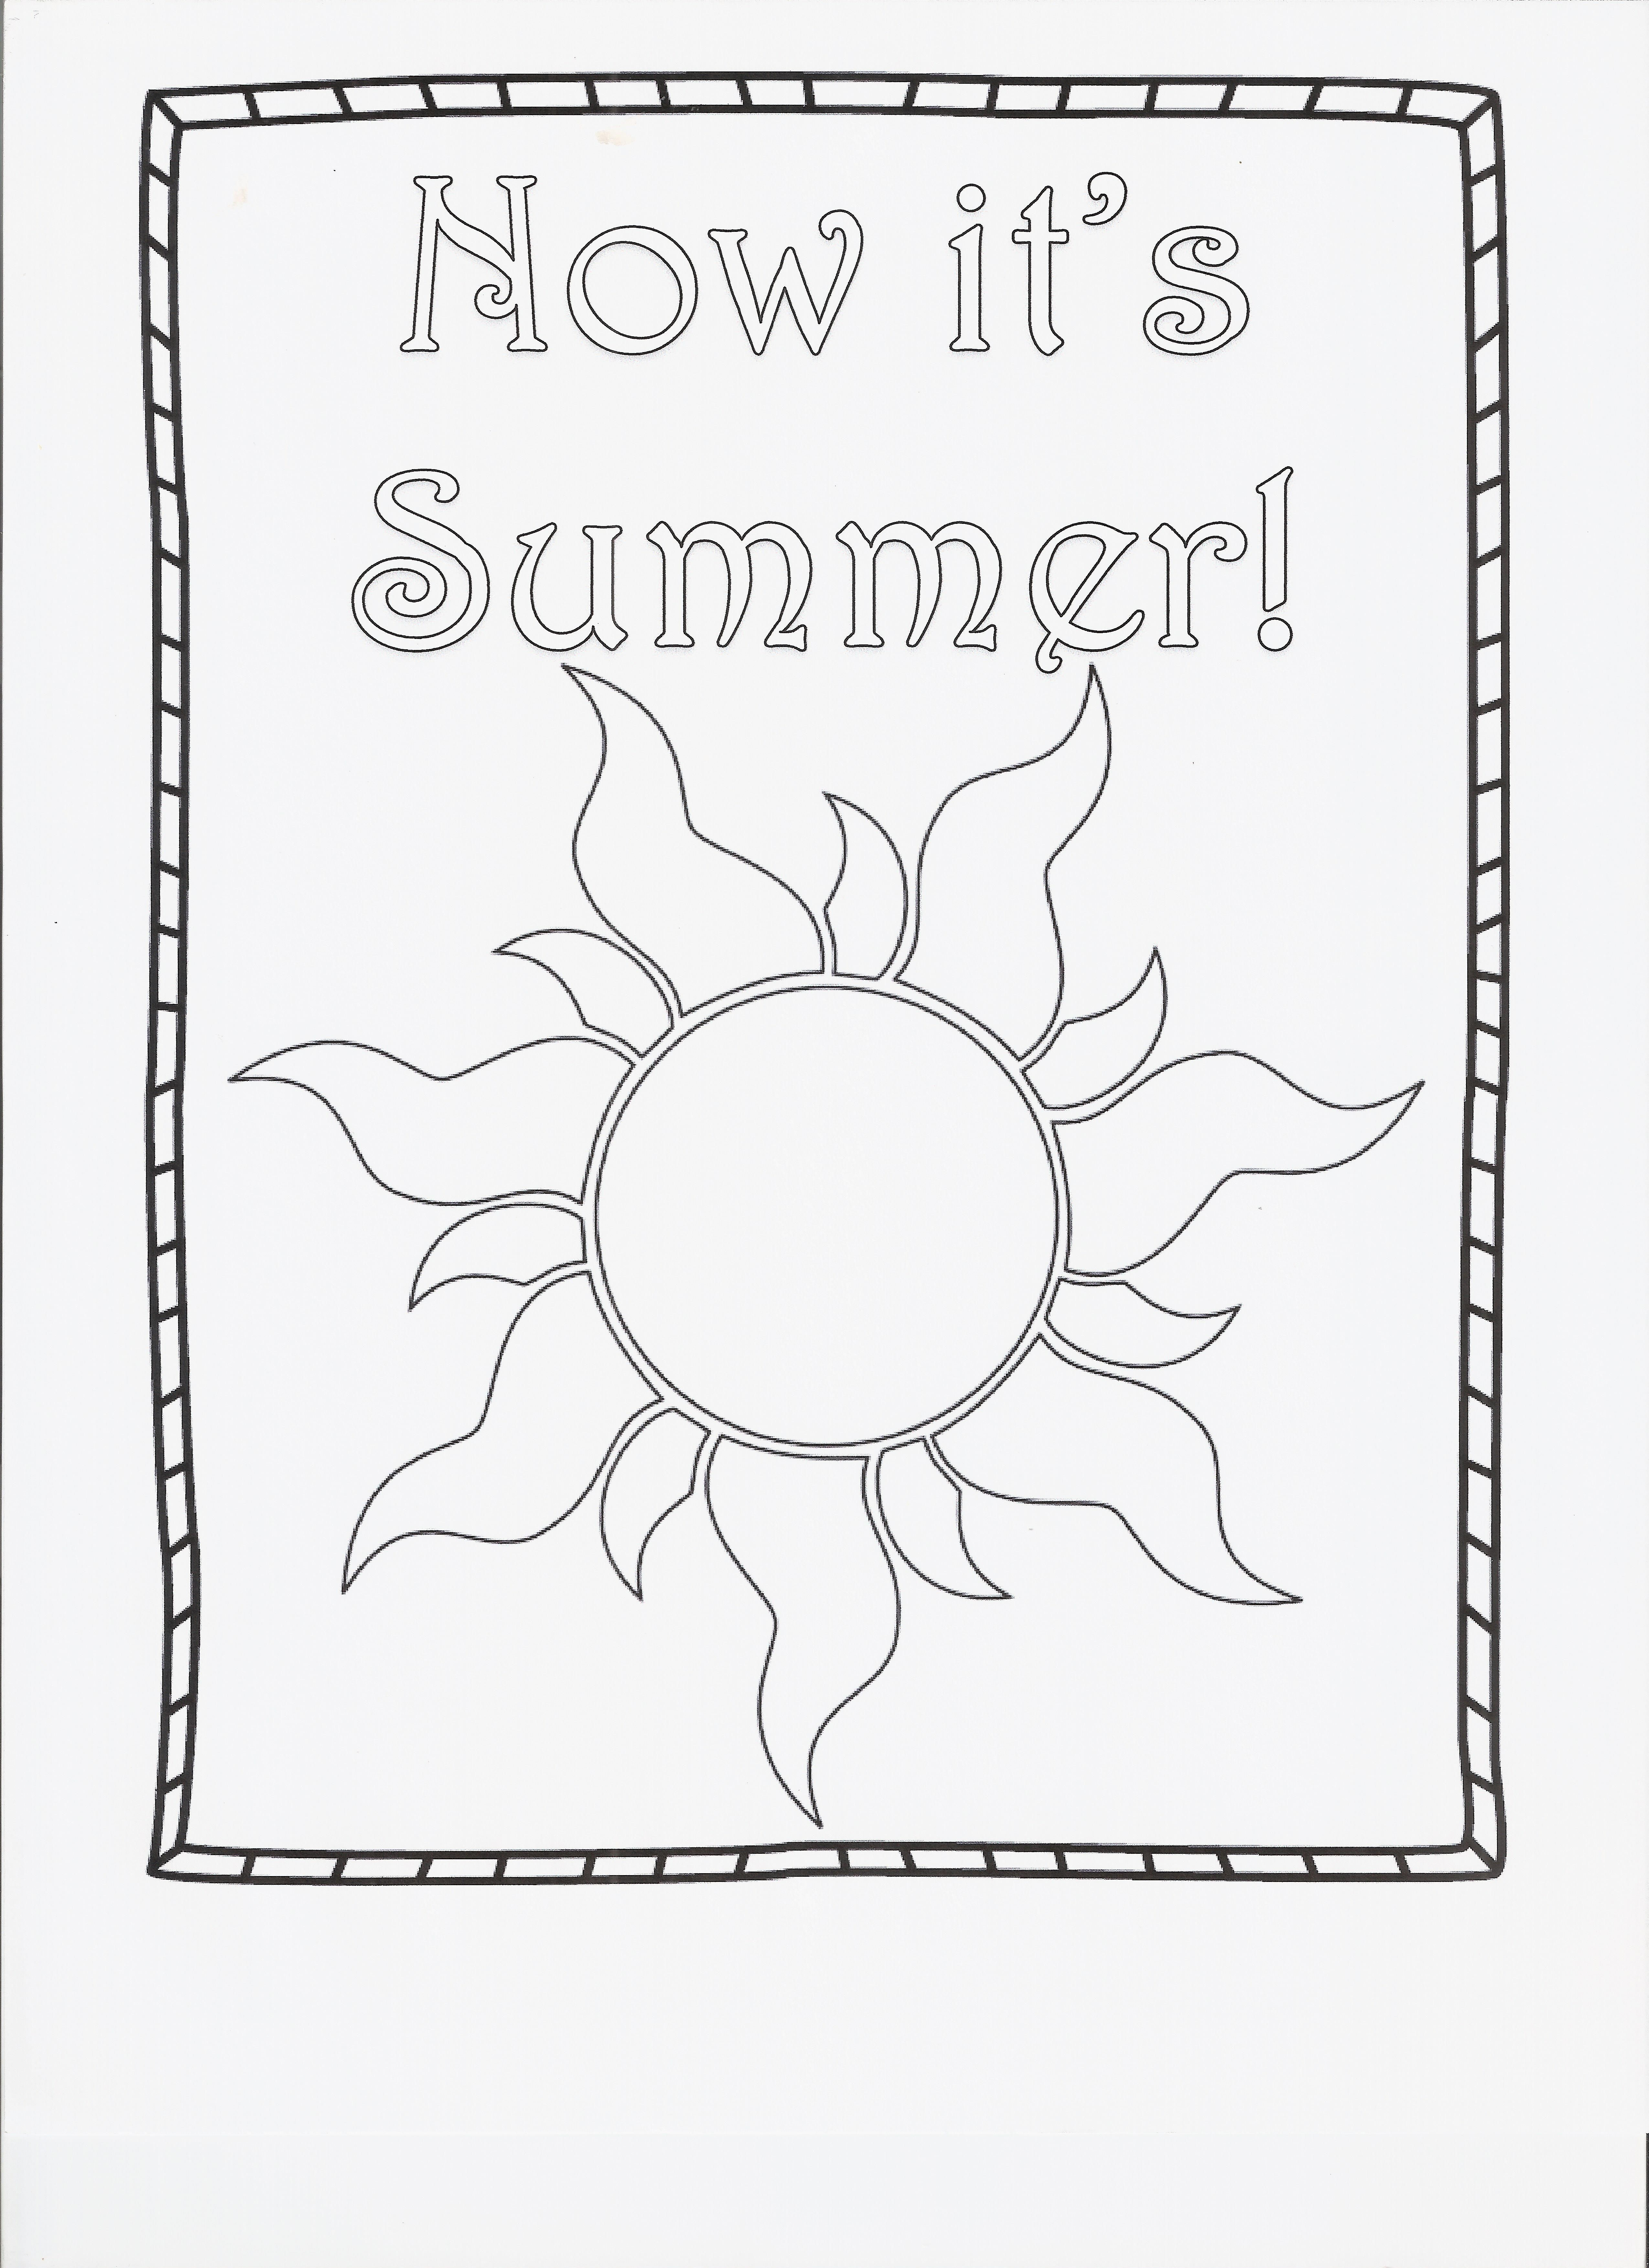 Summer Fun Coloring Page Worksheet End Of School